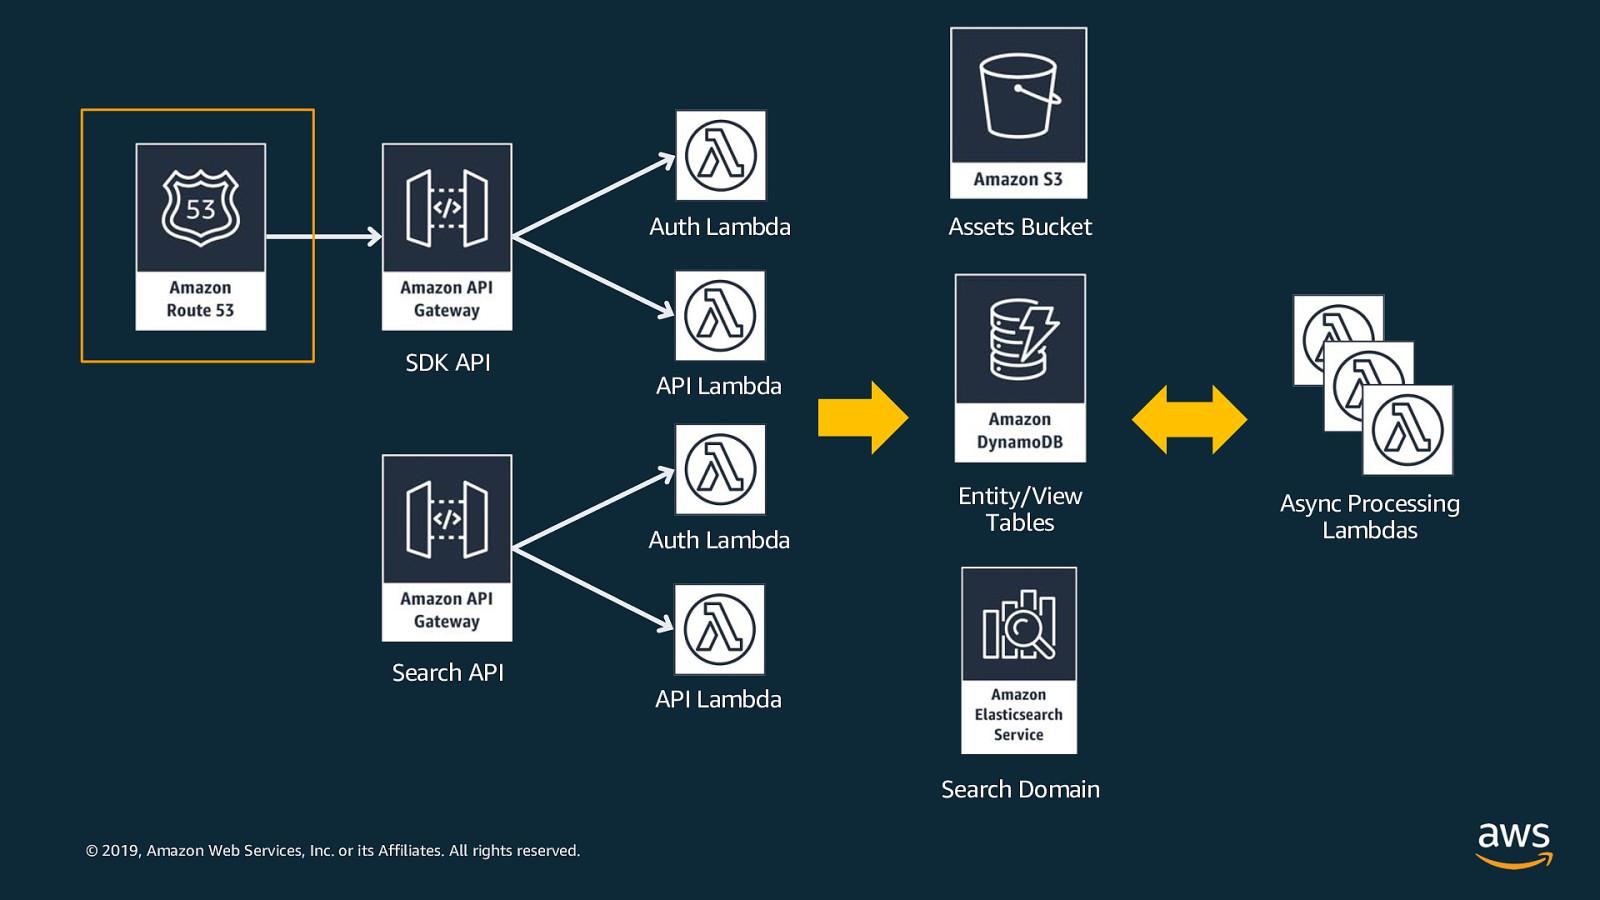 How AWS builds Serverless services using Serverless